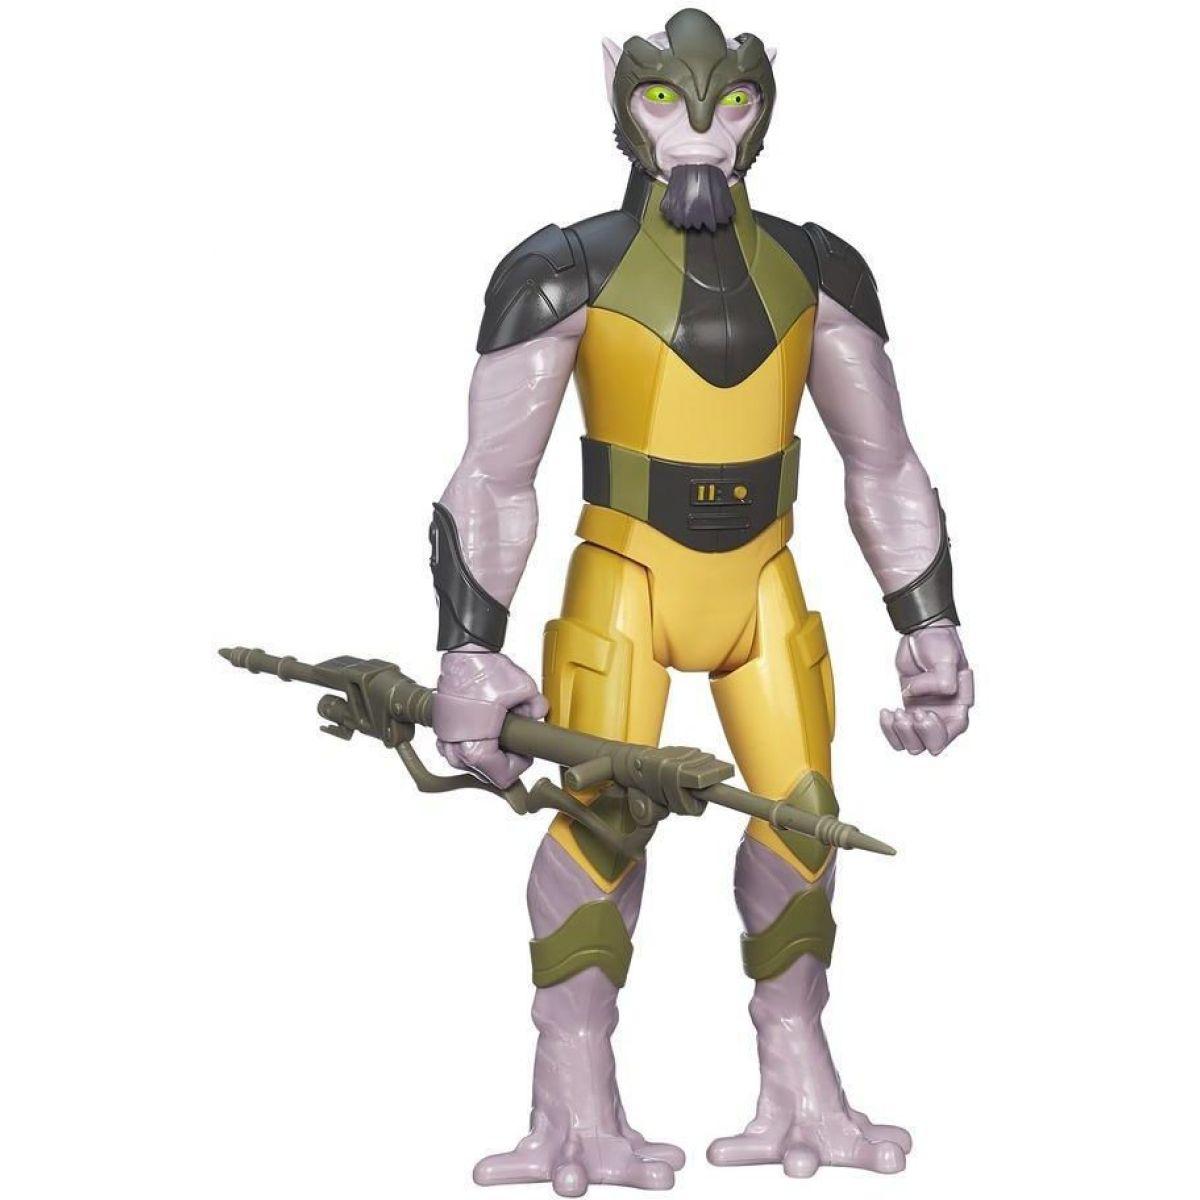 Hasbro Star Wars Akční figurka hrdiny - Garrazeb Zeb Orrelios